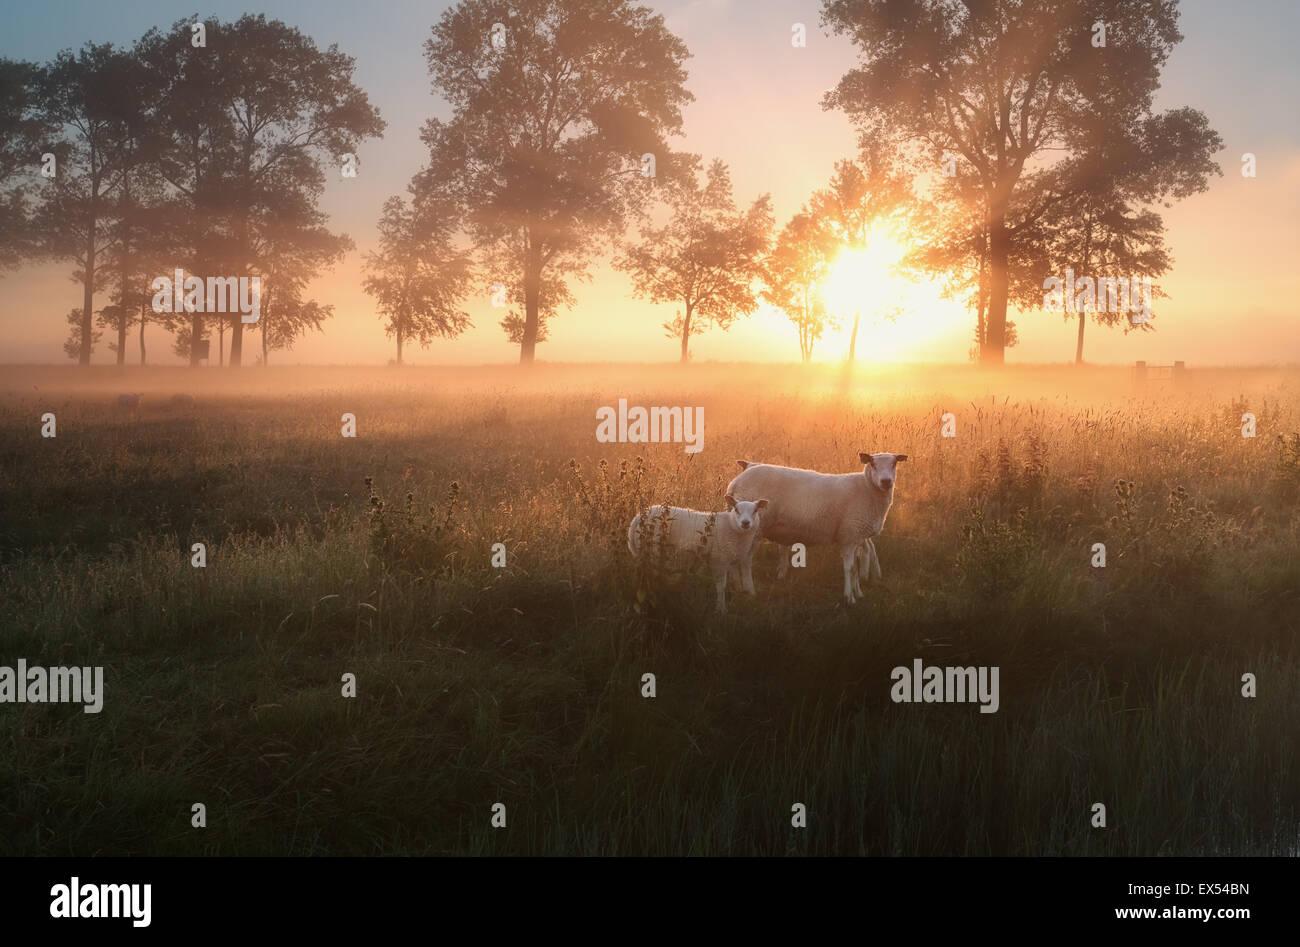 La oveja en el Misty pastura en verano sunrise Imagen De Stock